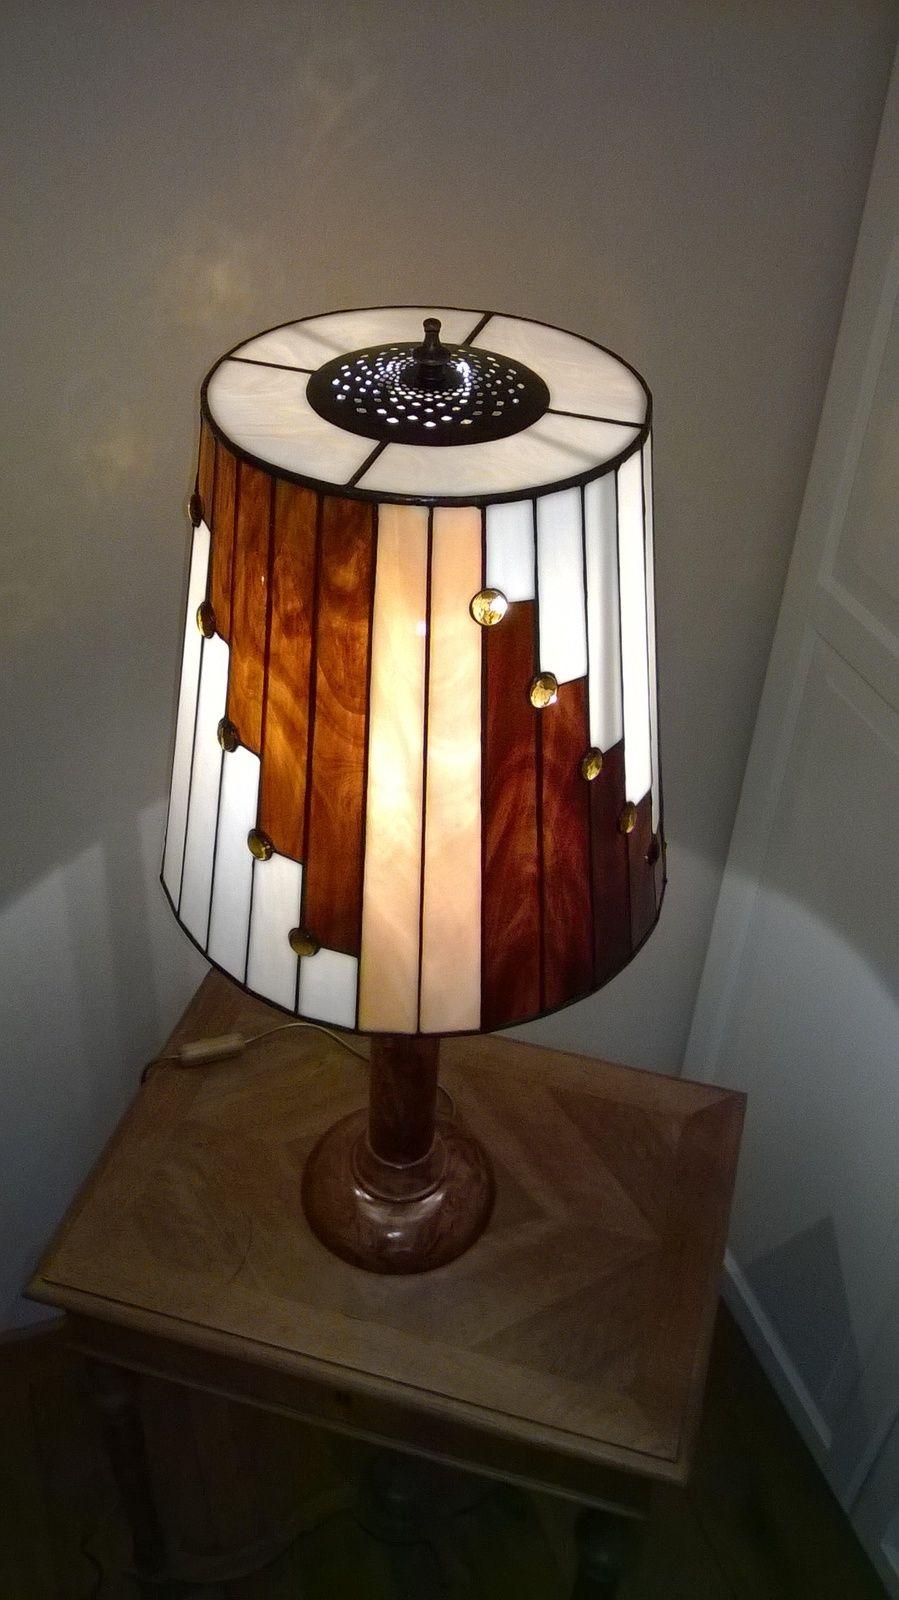 The Lampe Mf Creations Tiffany Lampe En Verre Dessins De Vitraux Verre En Mosaique